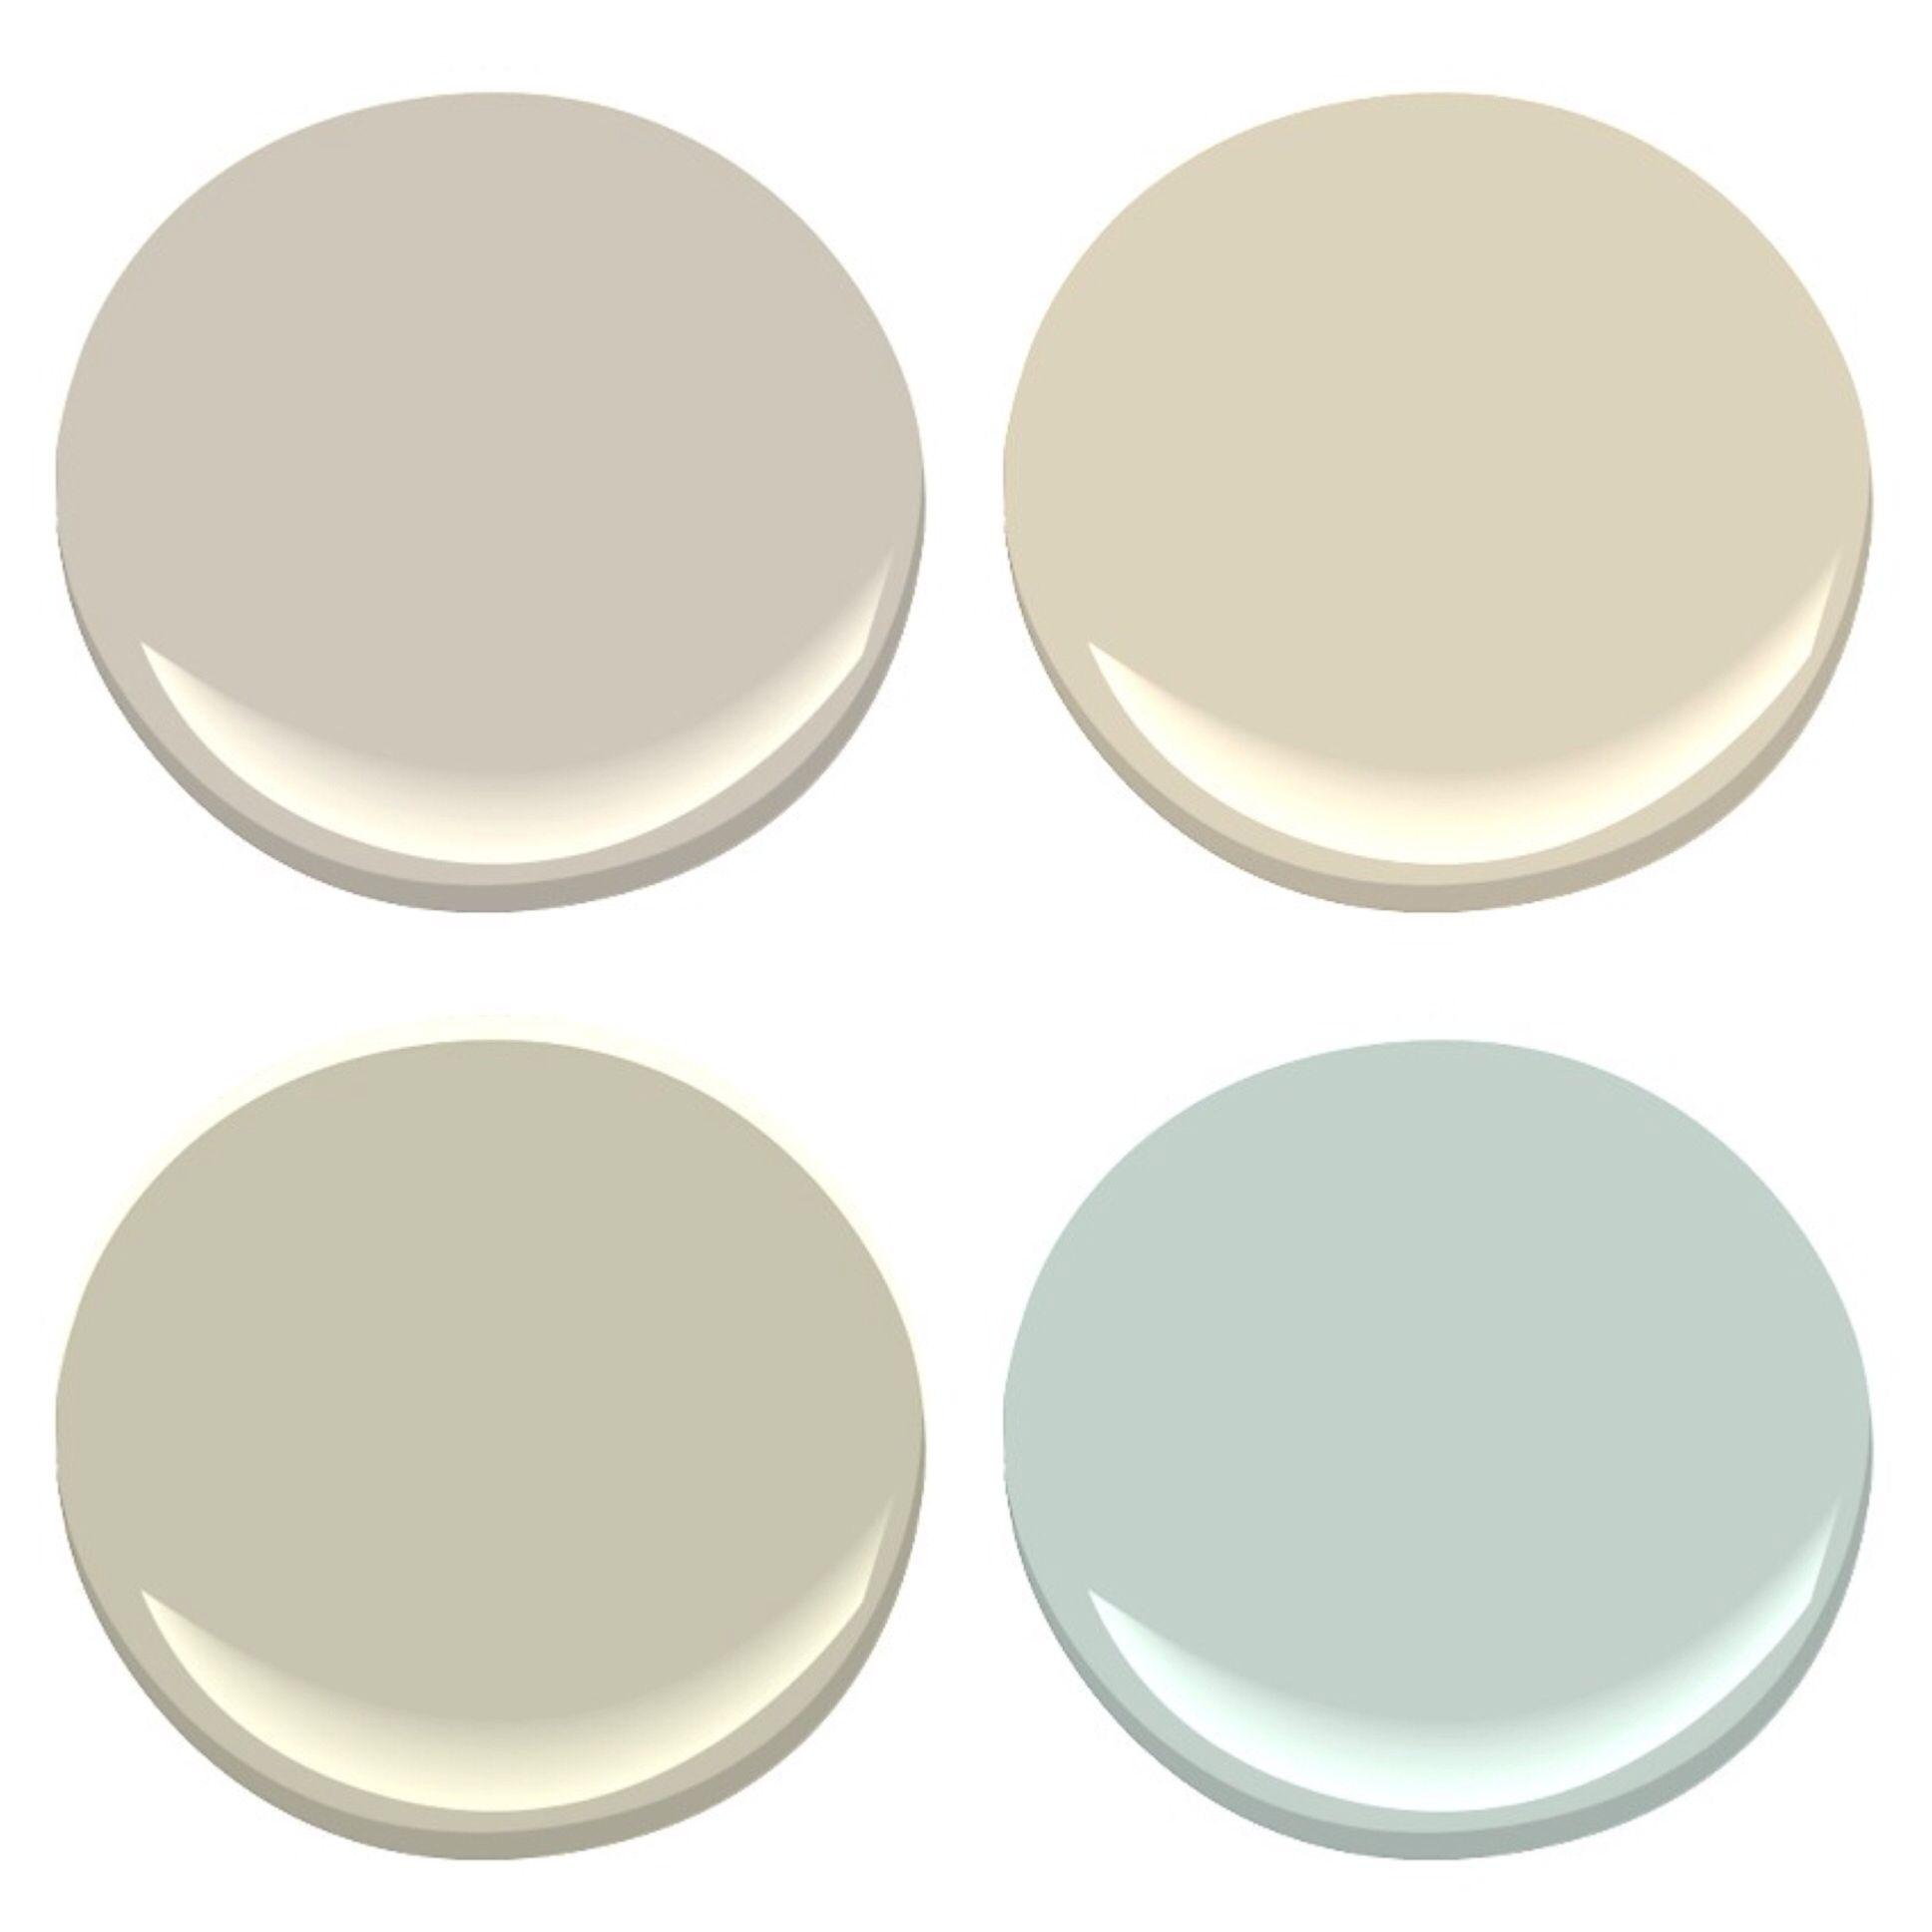 Tan Bedroom Benjamin Moore Manchester Tan And Beige: New House Neutral Paint Palette? Benjamin Moore Revere